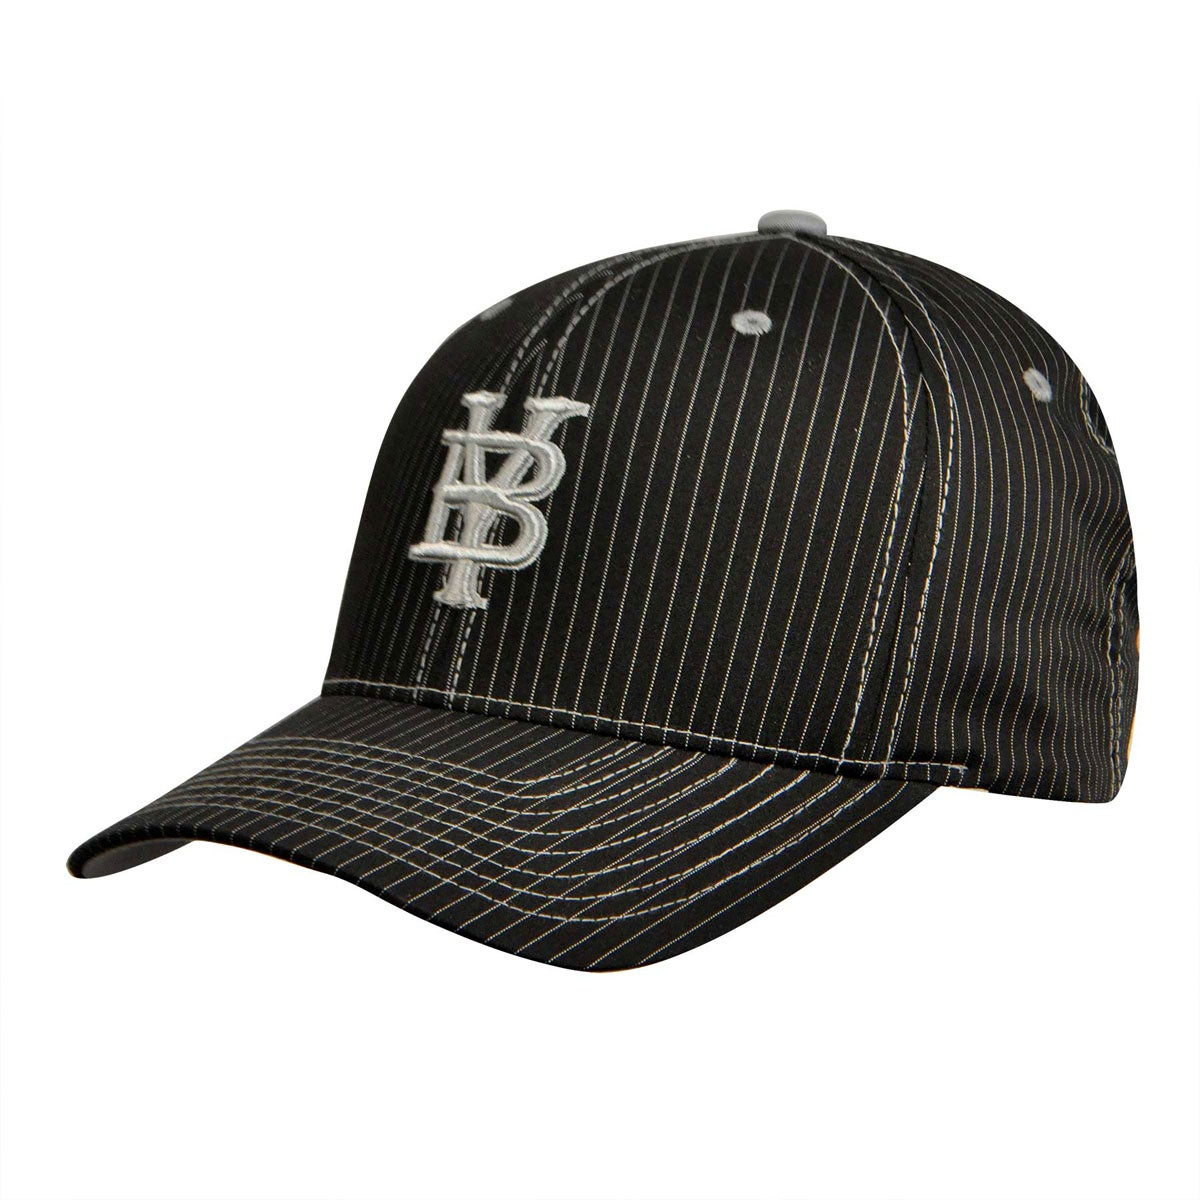 Bailey Western Legion Baseball Cap in Black Pin Stripe